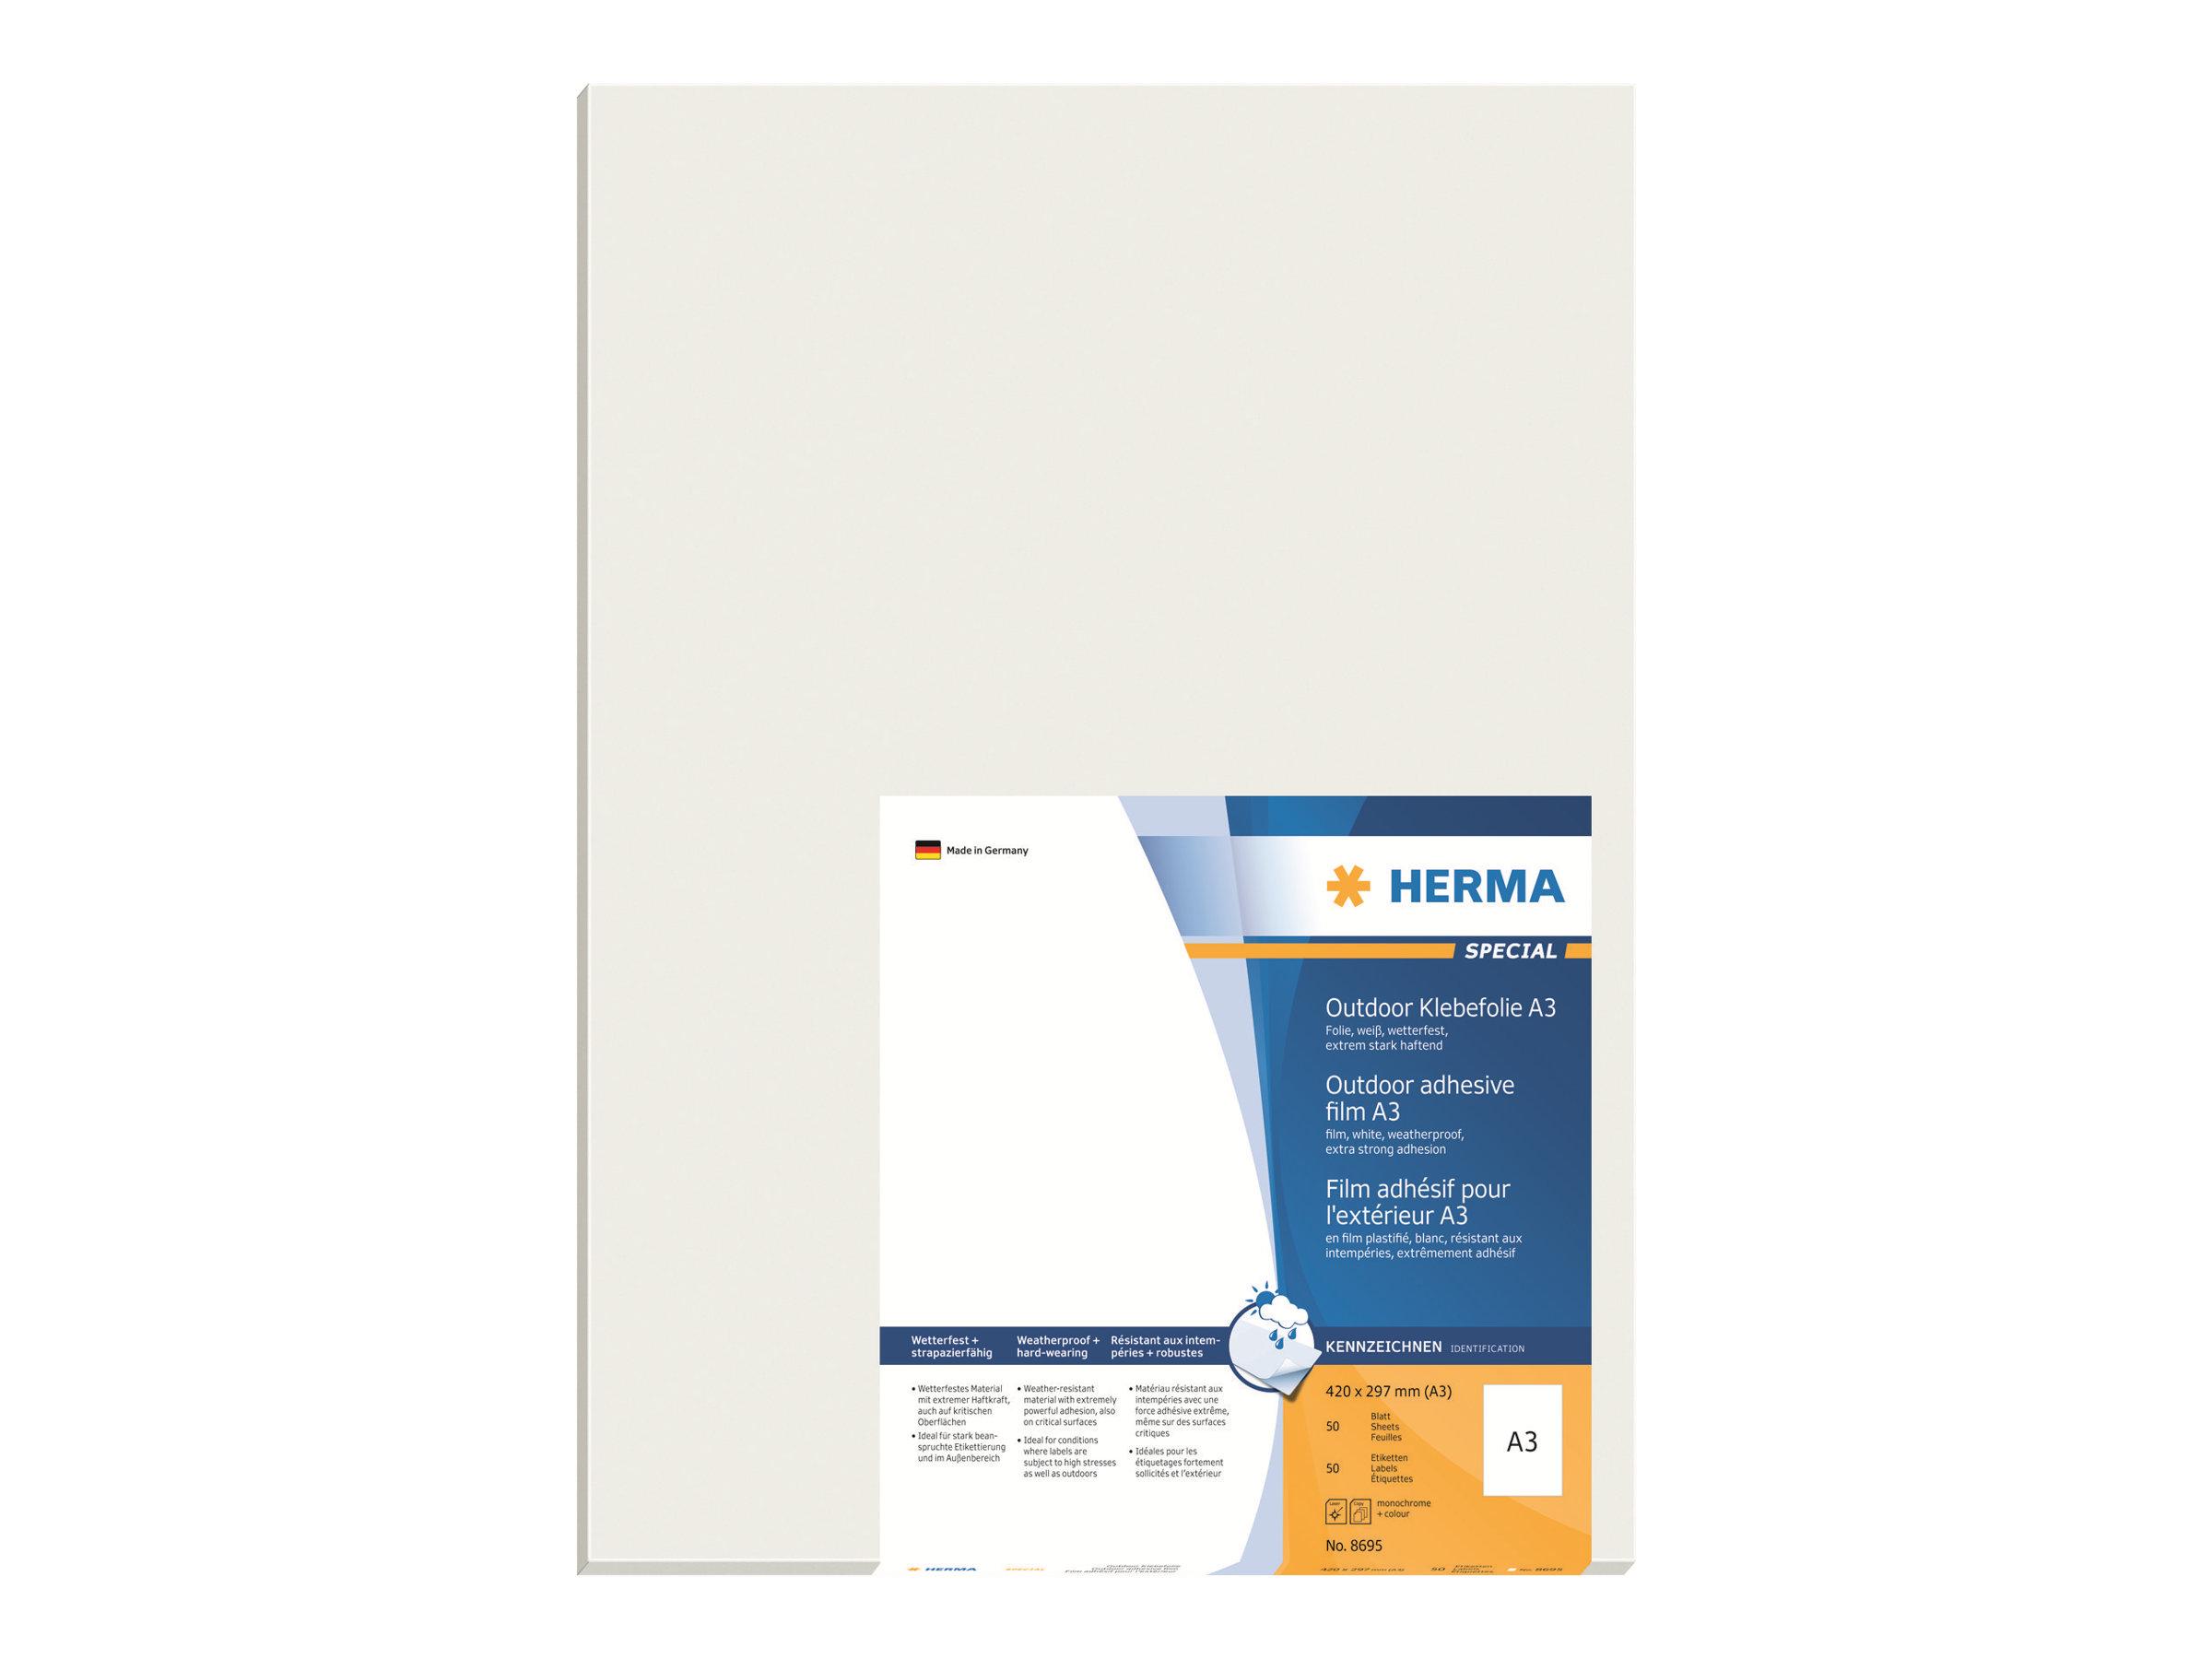 HERMA Special - Polyethylen (PE) - matt - selbstklebend - weiß - A3 (297 x 420 mm)